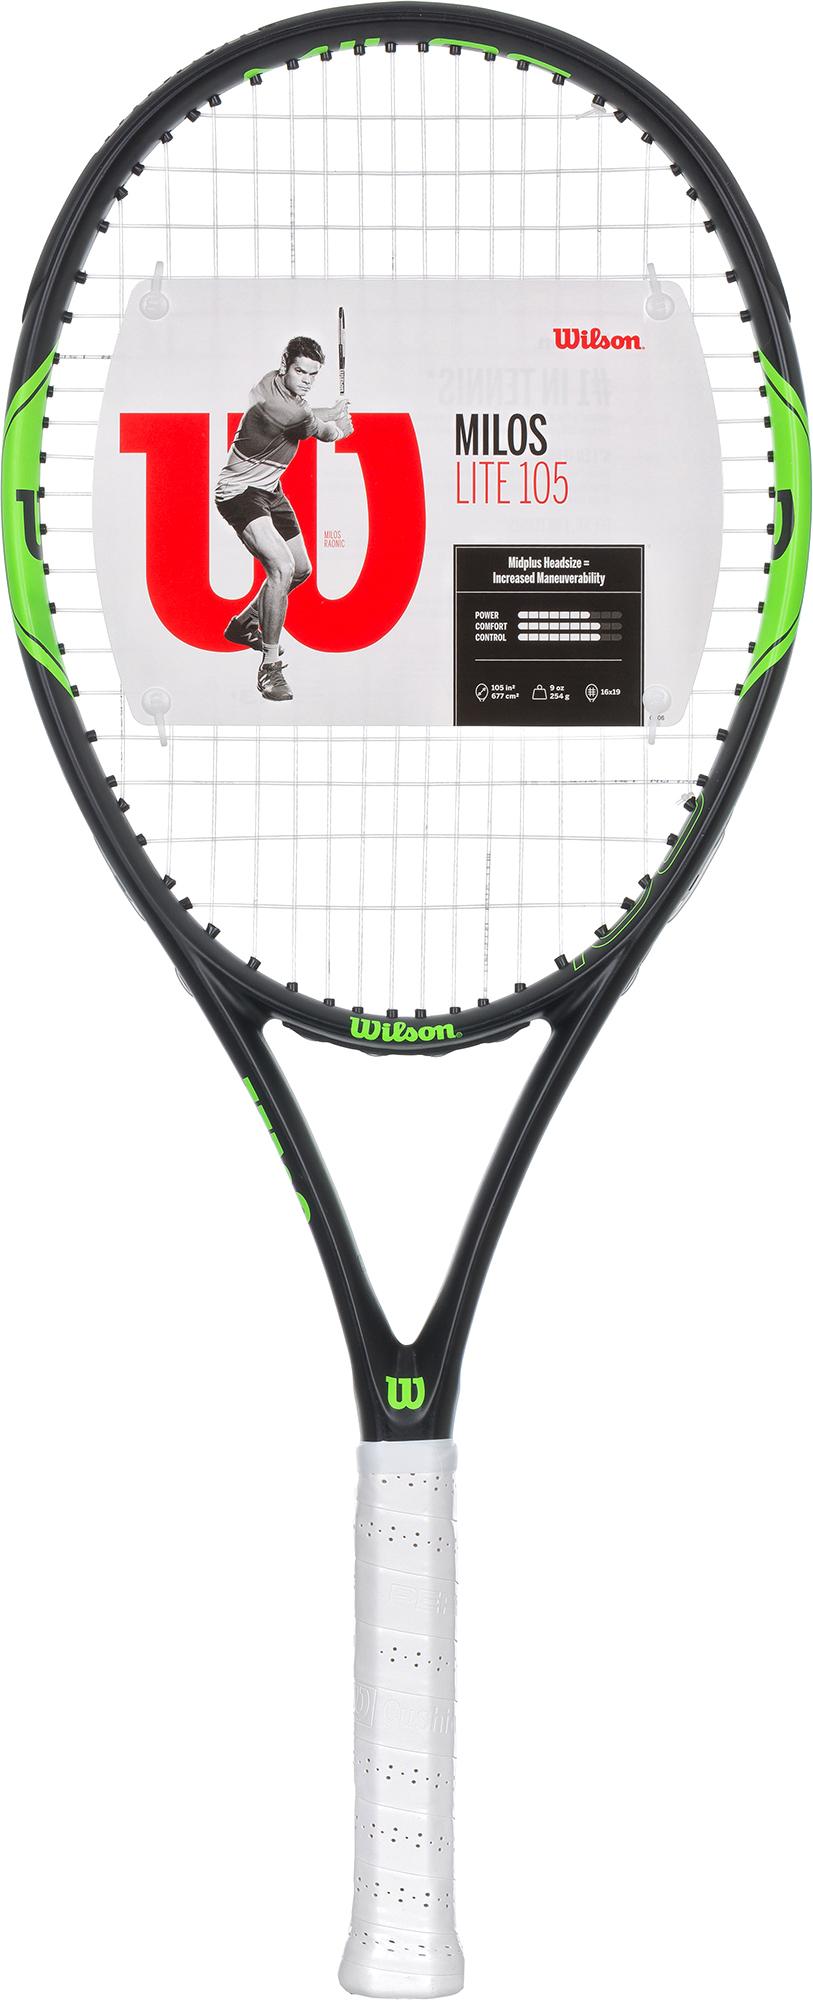 Wilson Ракетка для большого тенниса Wilson Milos Lite 105, размер 3 wilson ракетка для большого тенниса детская wilson roger federer 23 размер без размера